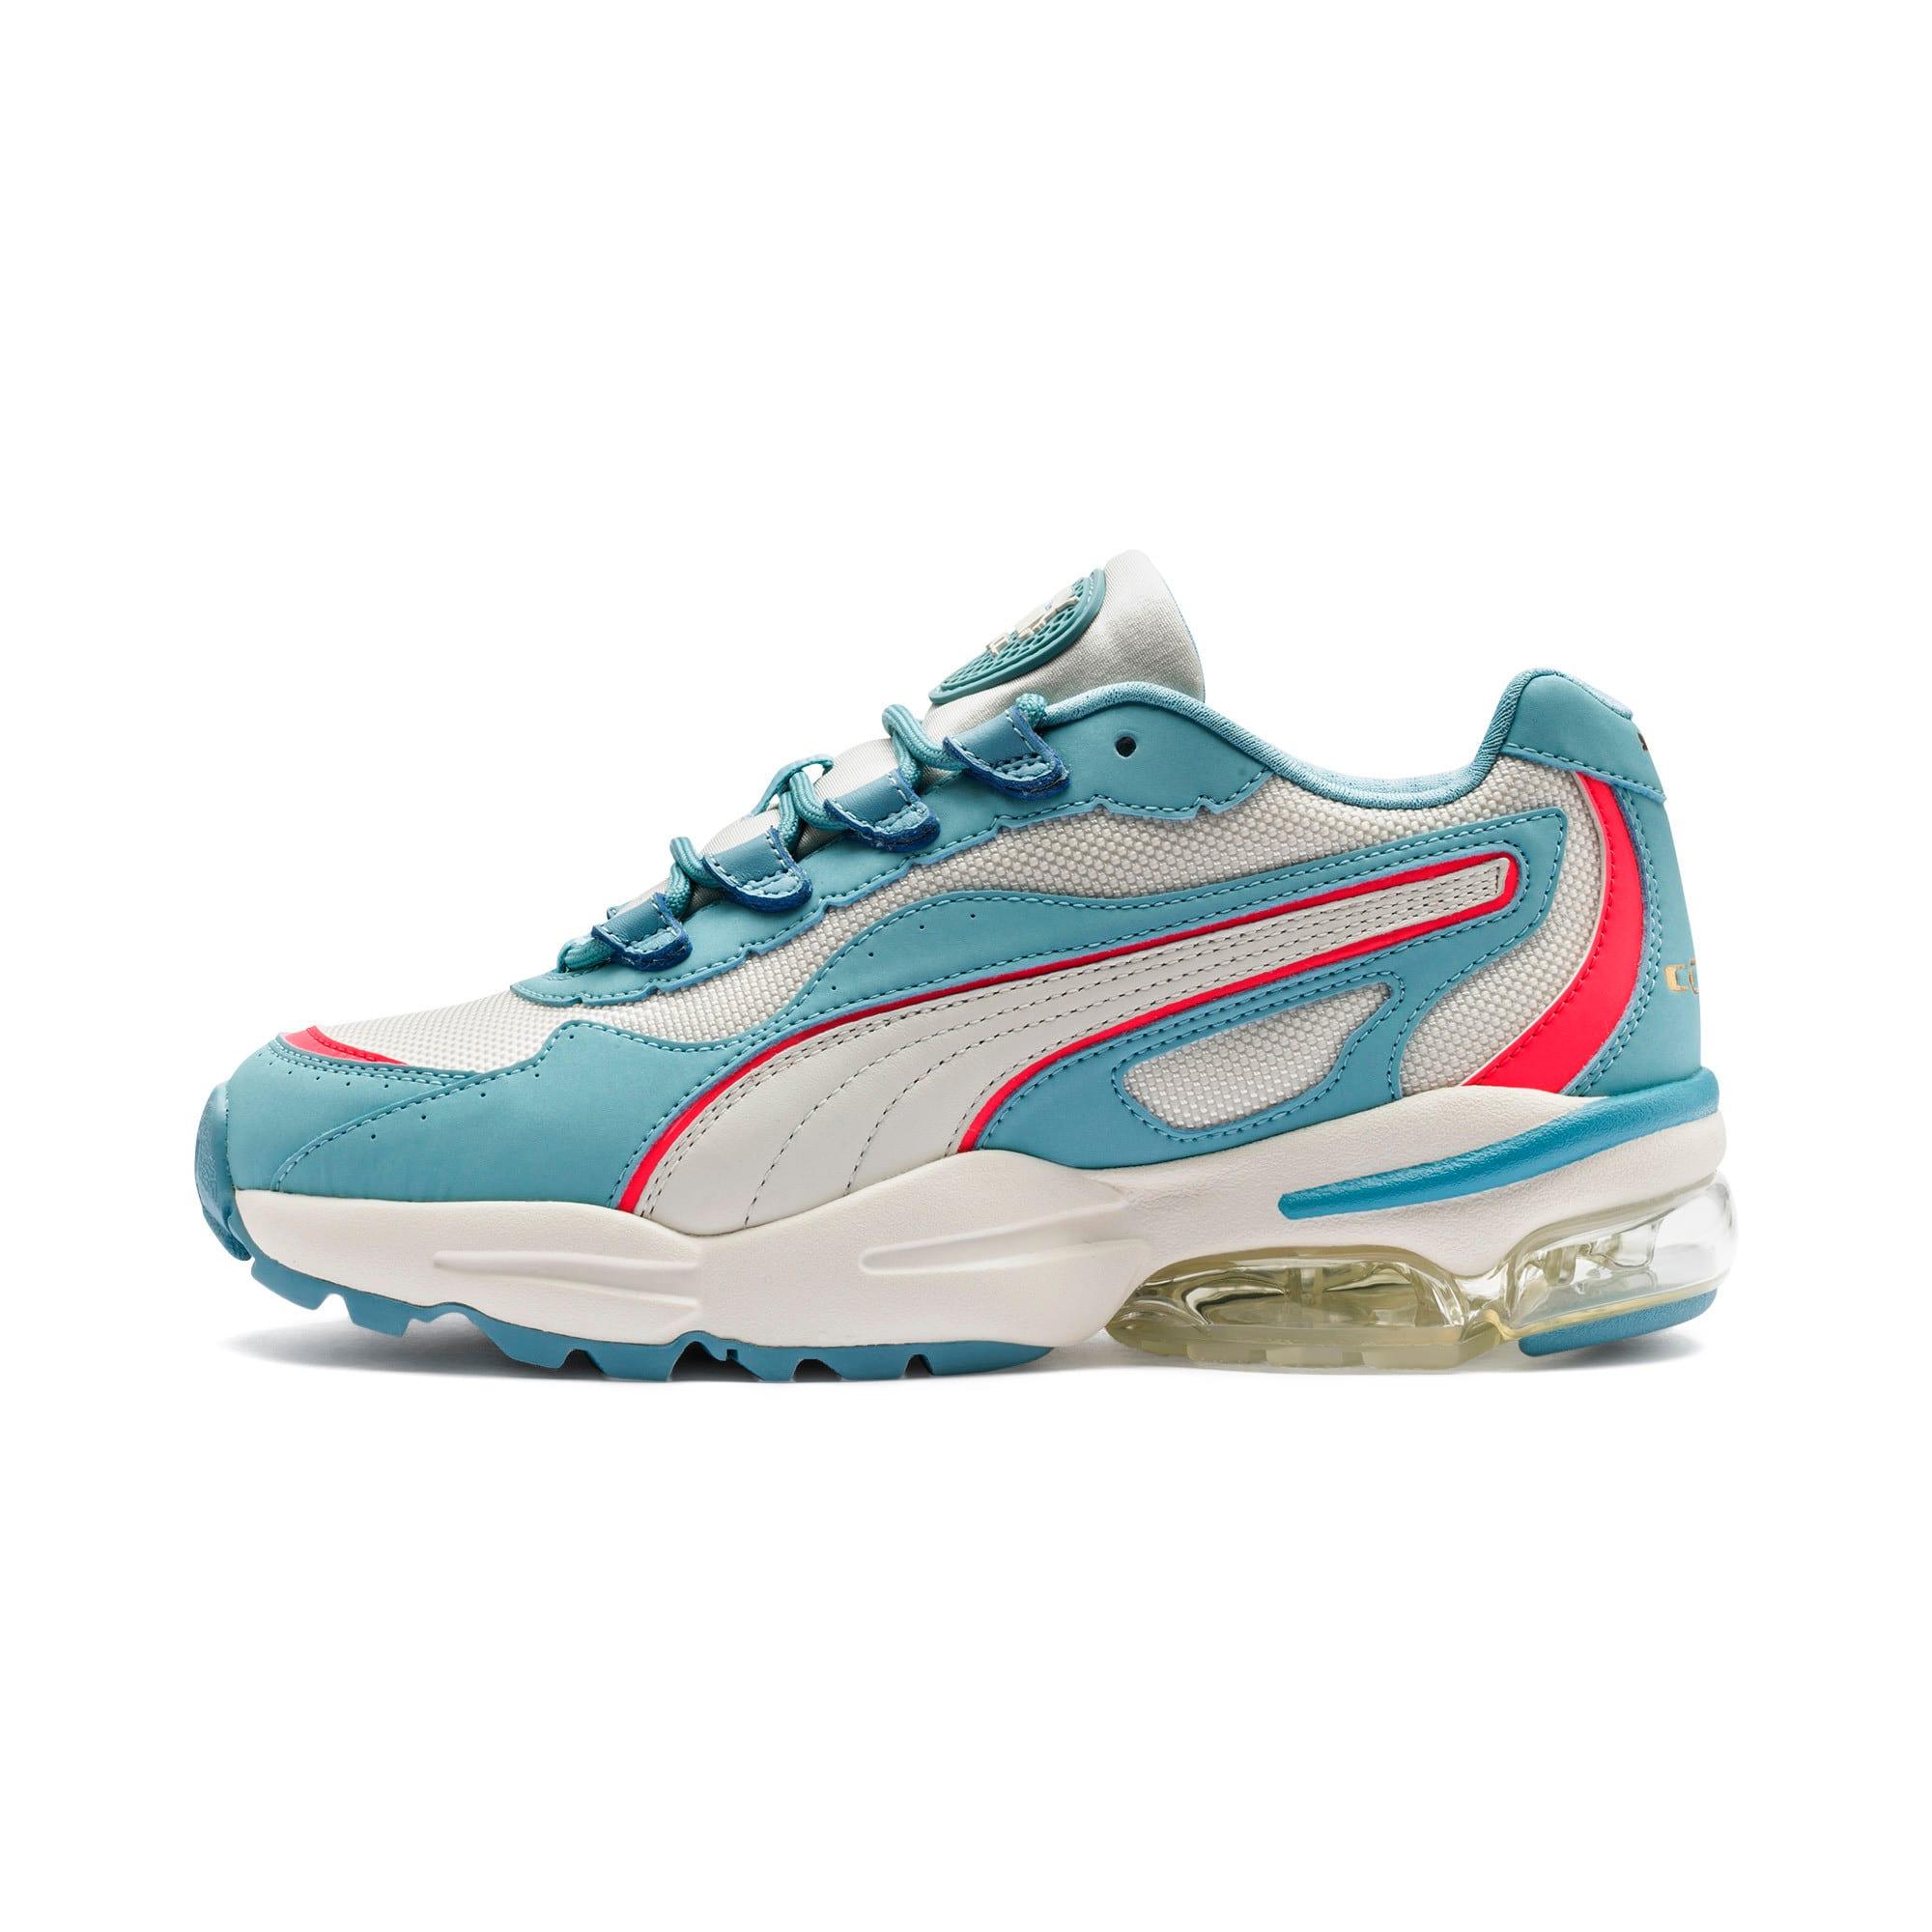 Miniatura 1 de Zapatos deportivos CELL Stellar para mujer, Milky Blue-Puma Team Gold, mediano